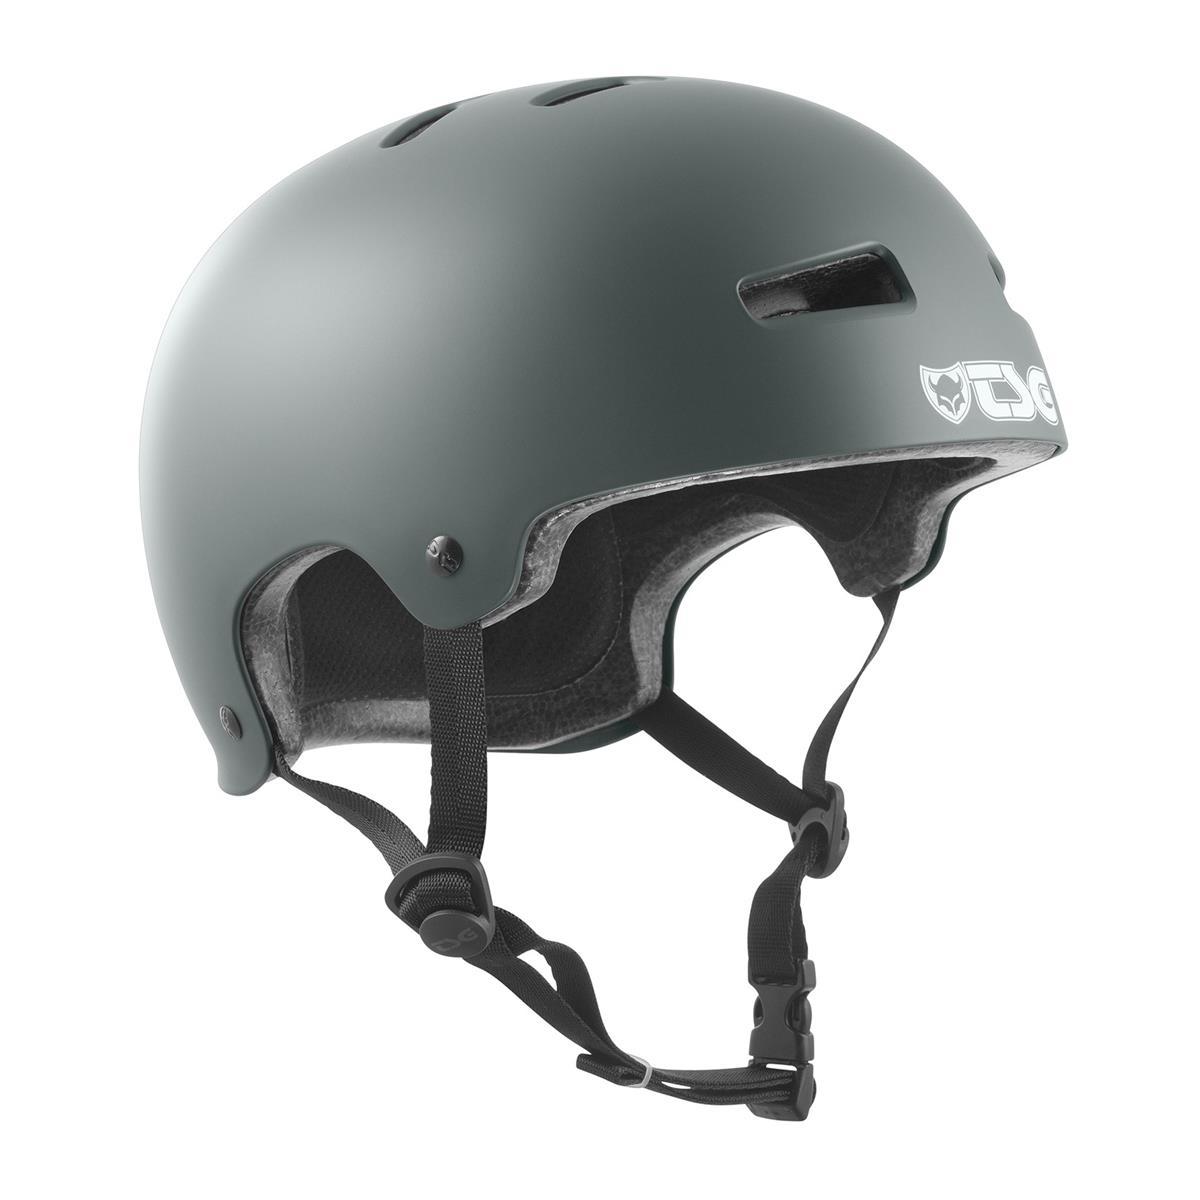 TSG BMX/Dirt Helmet Evolution Solid Color - Satin Marsh